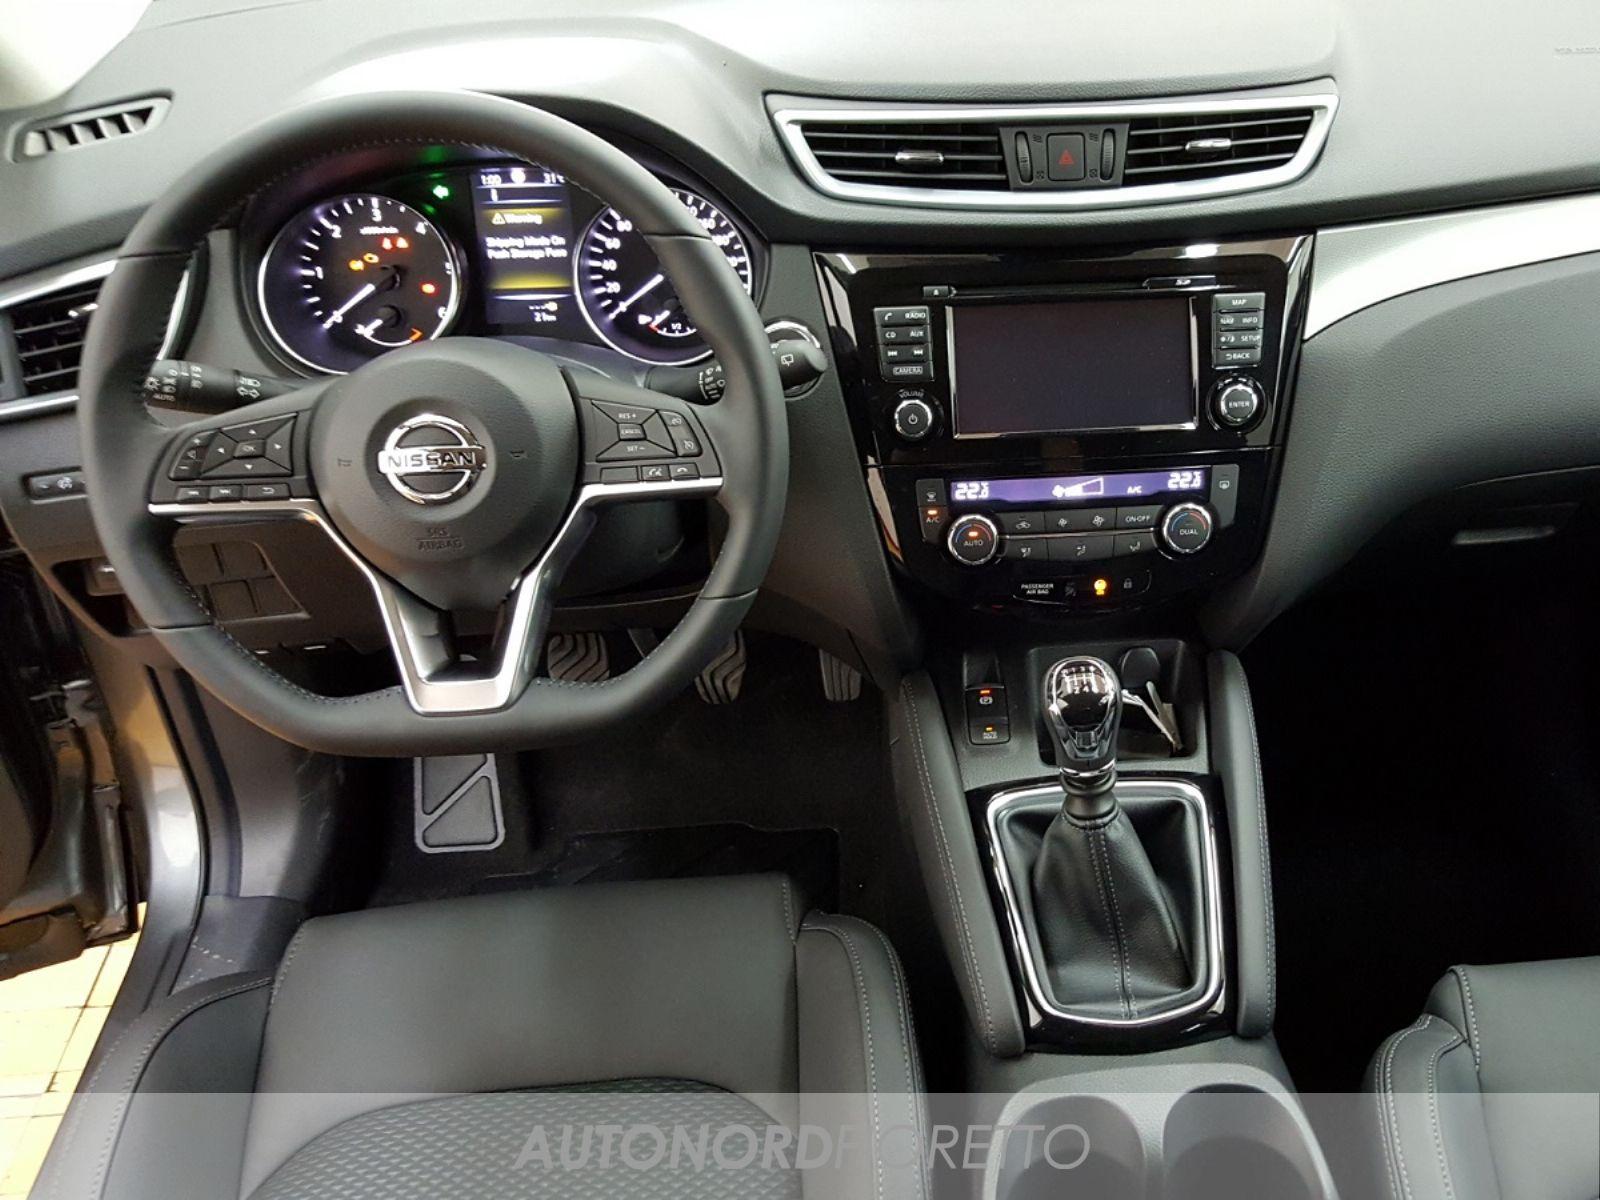 AUTONORD Nissan Qashqai